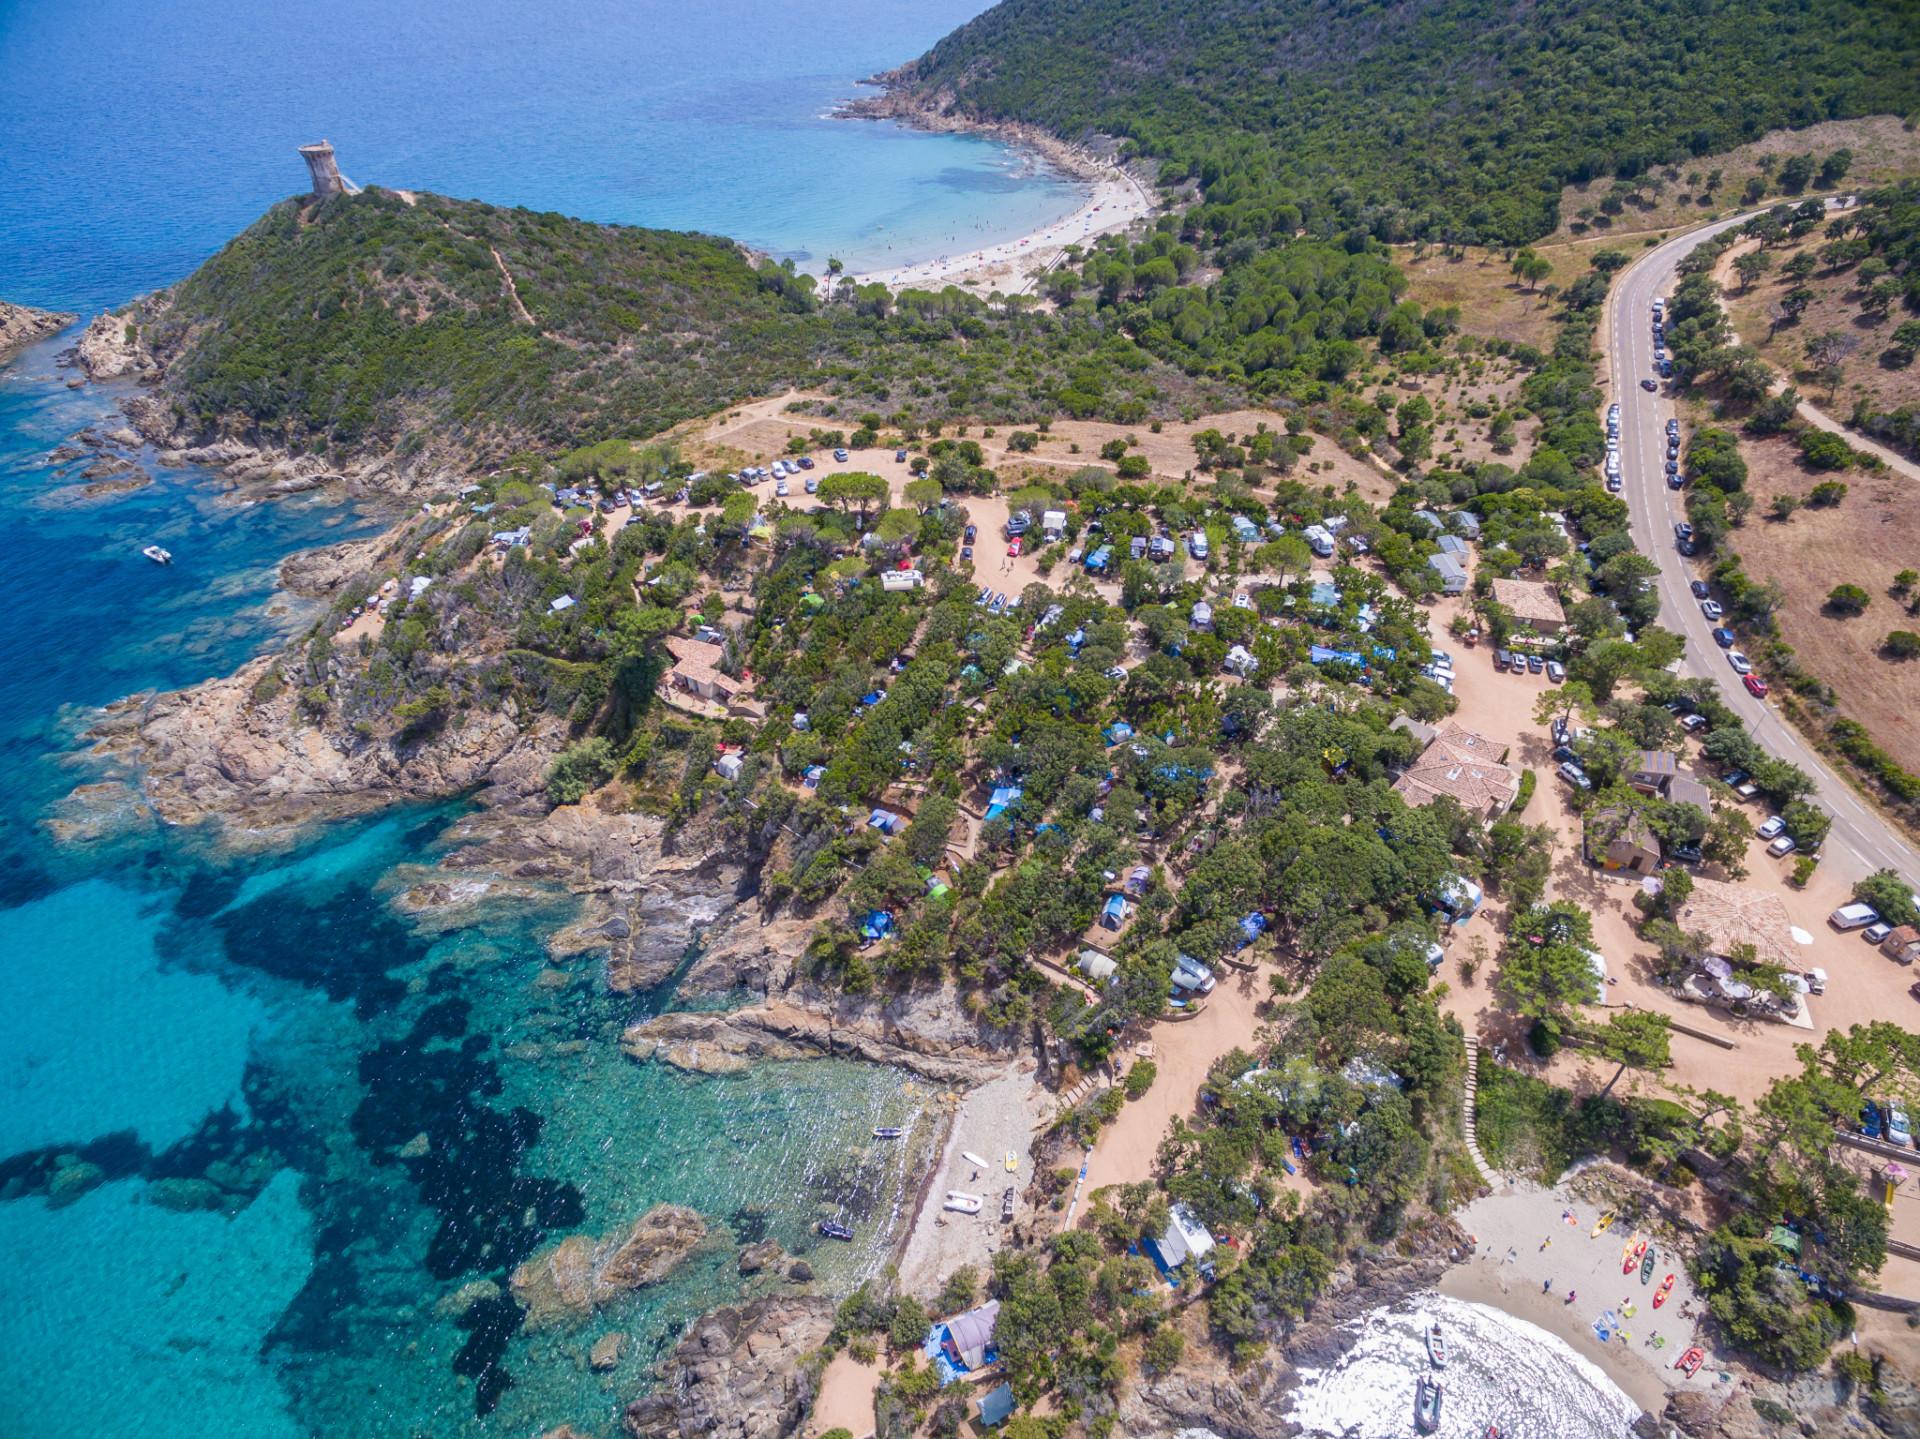 Camping an der Ostküste auf Korsika